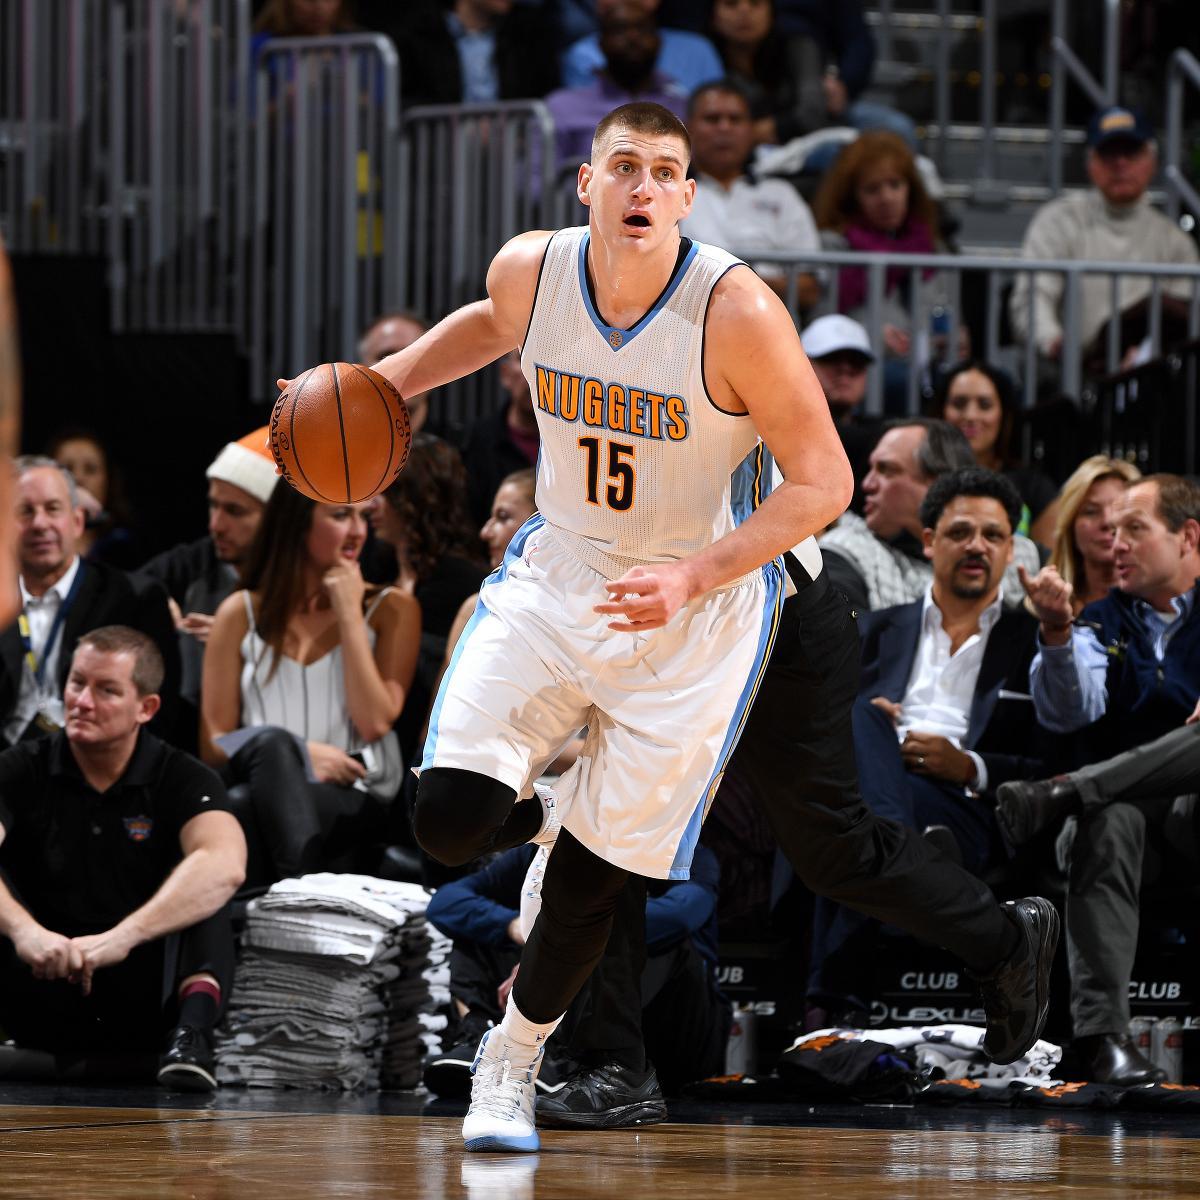 Nuggets Quarter Season Tickets: Nikola Jokic Injury: Updates On Nuggets Star's Hip And